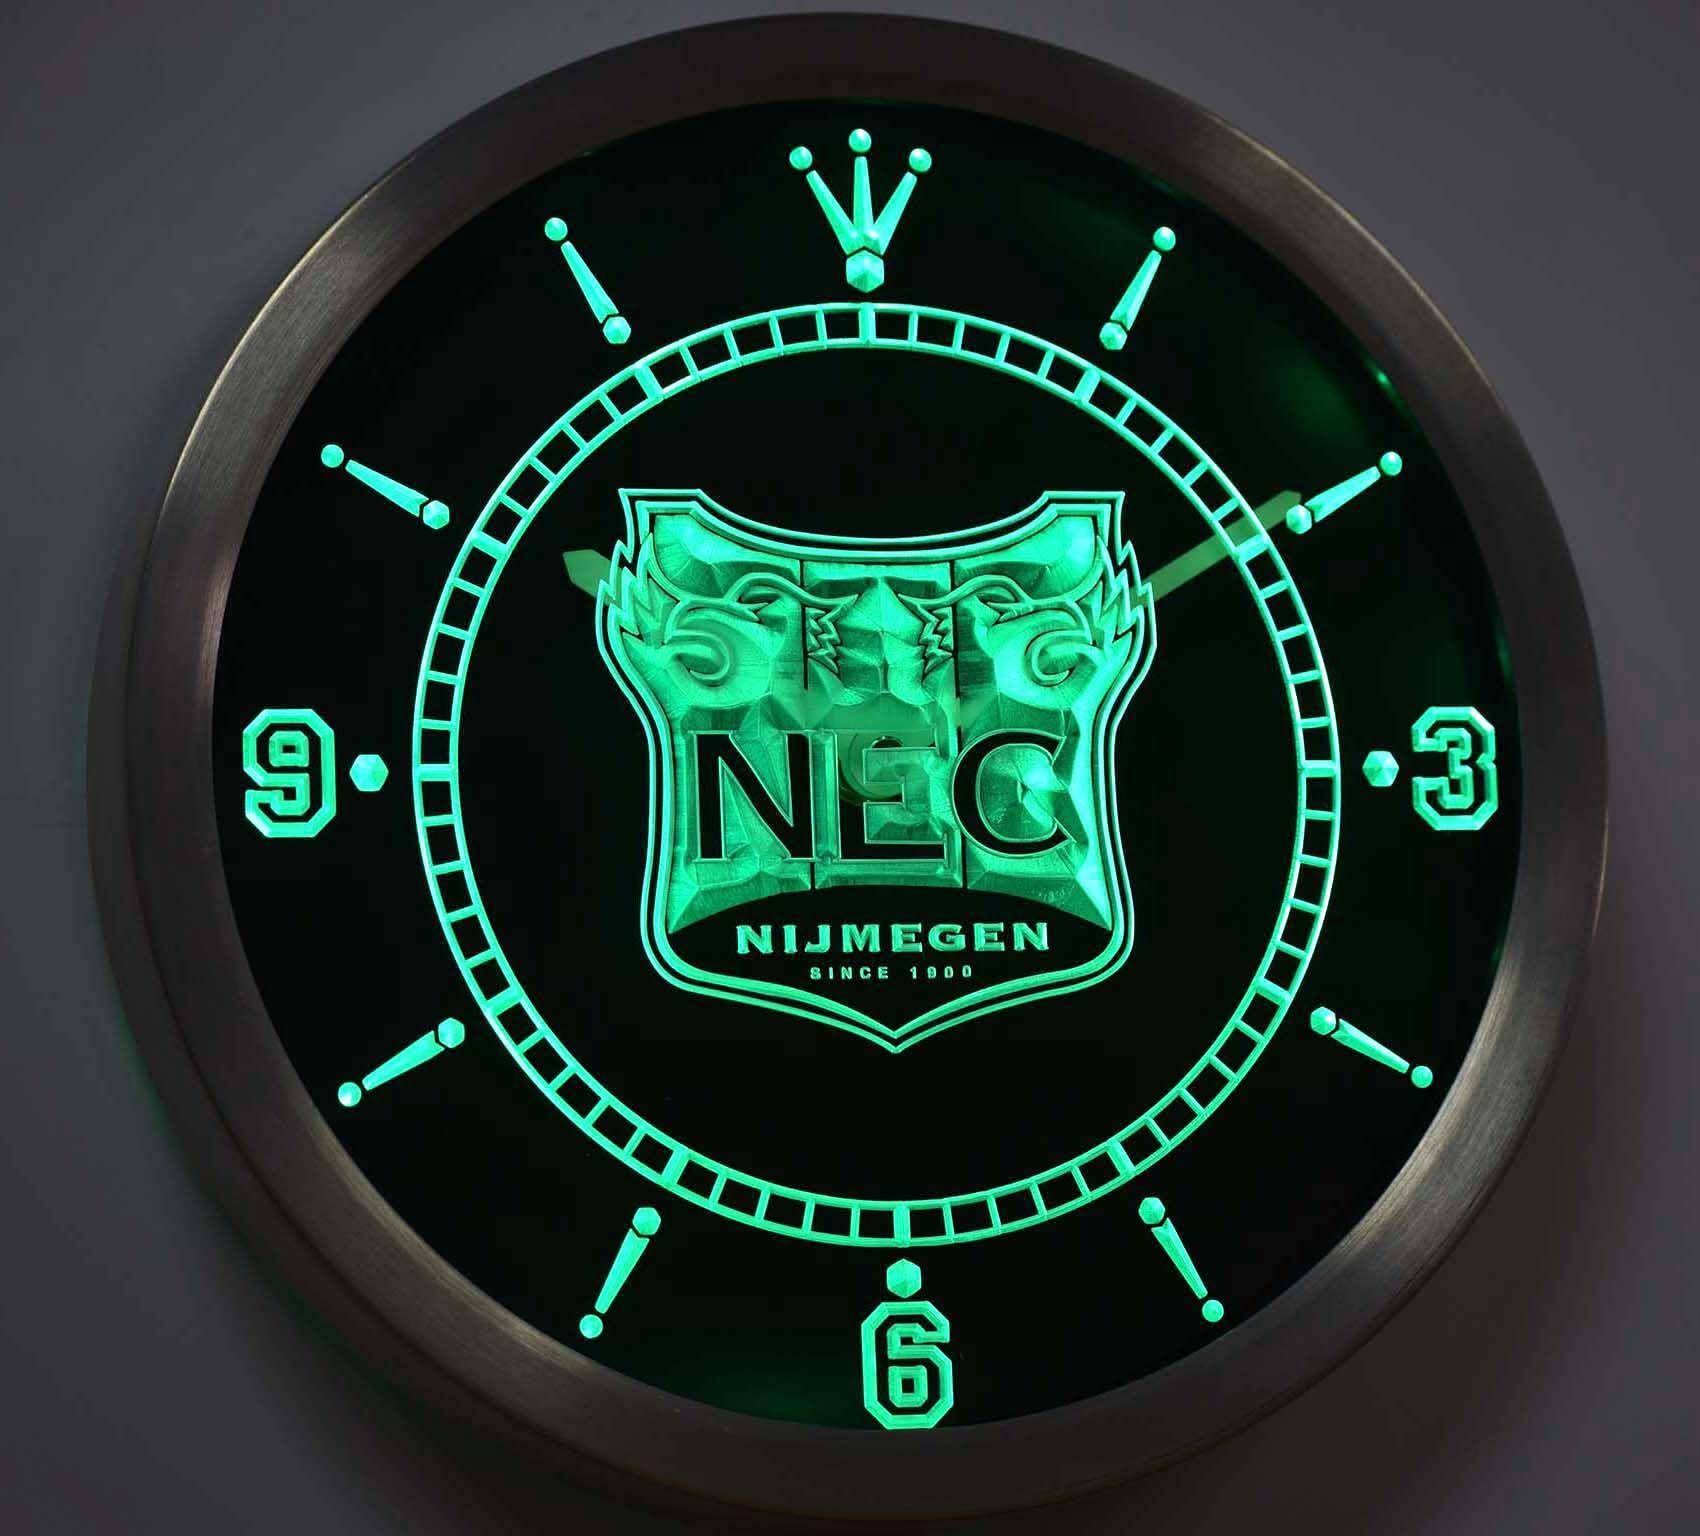 Nc1020 Nec Nijmegen Eredivisie Football Neon Sign Led Wall Clock With Images Led Wall Clock Wall Clock Clock